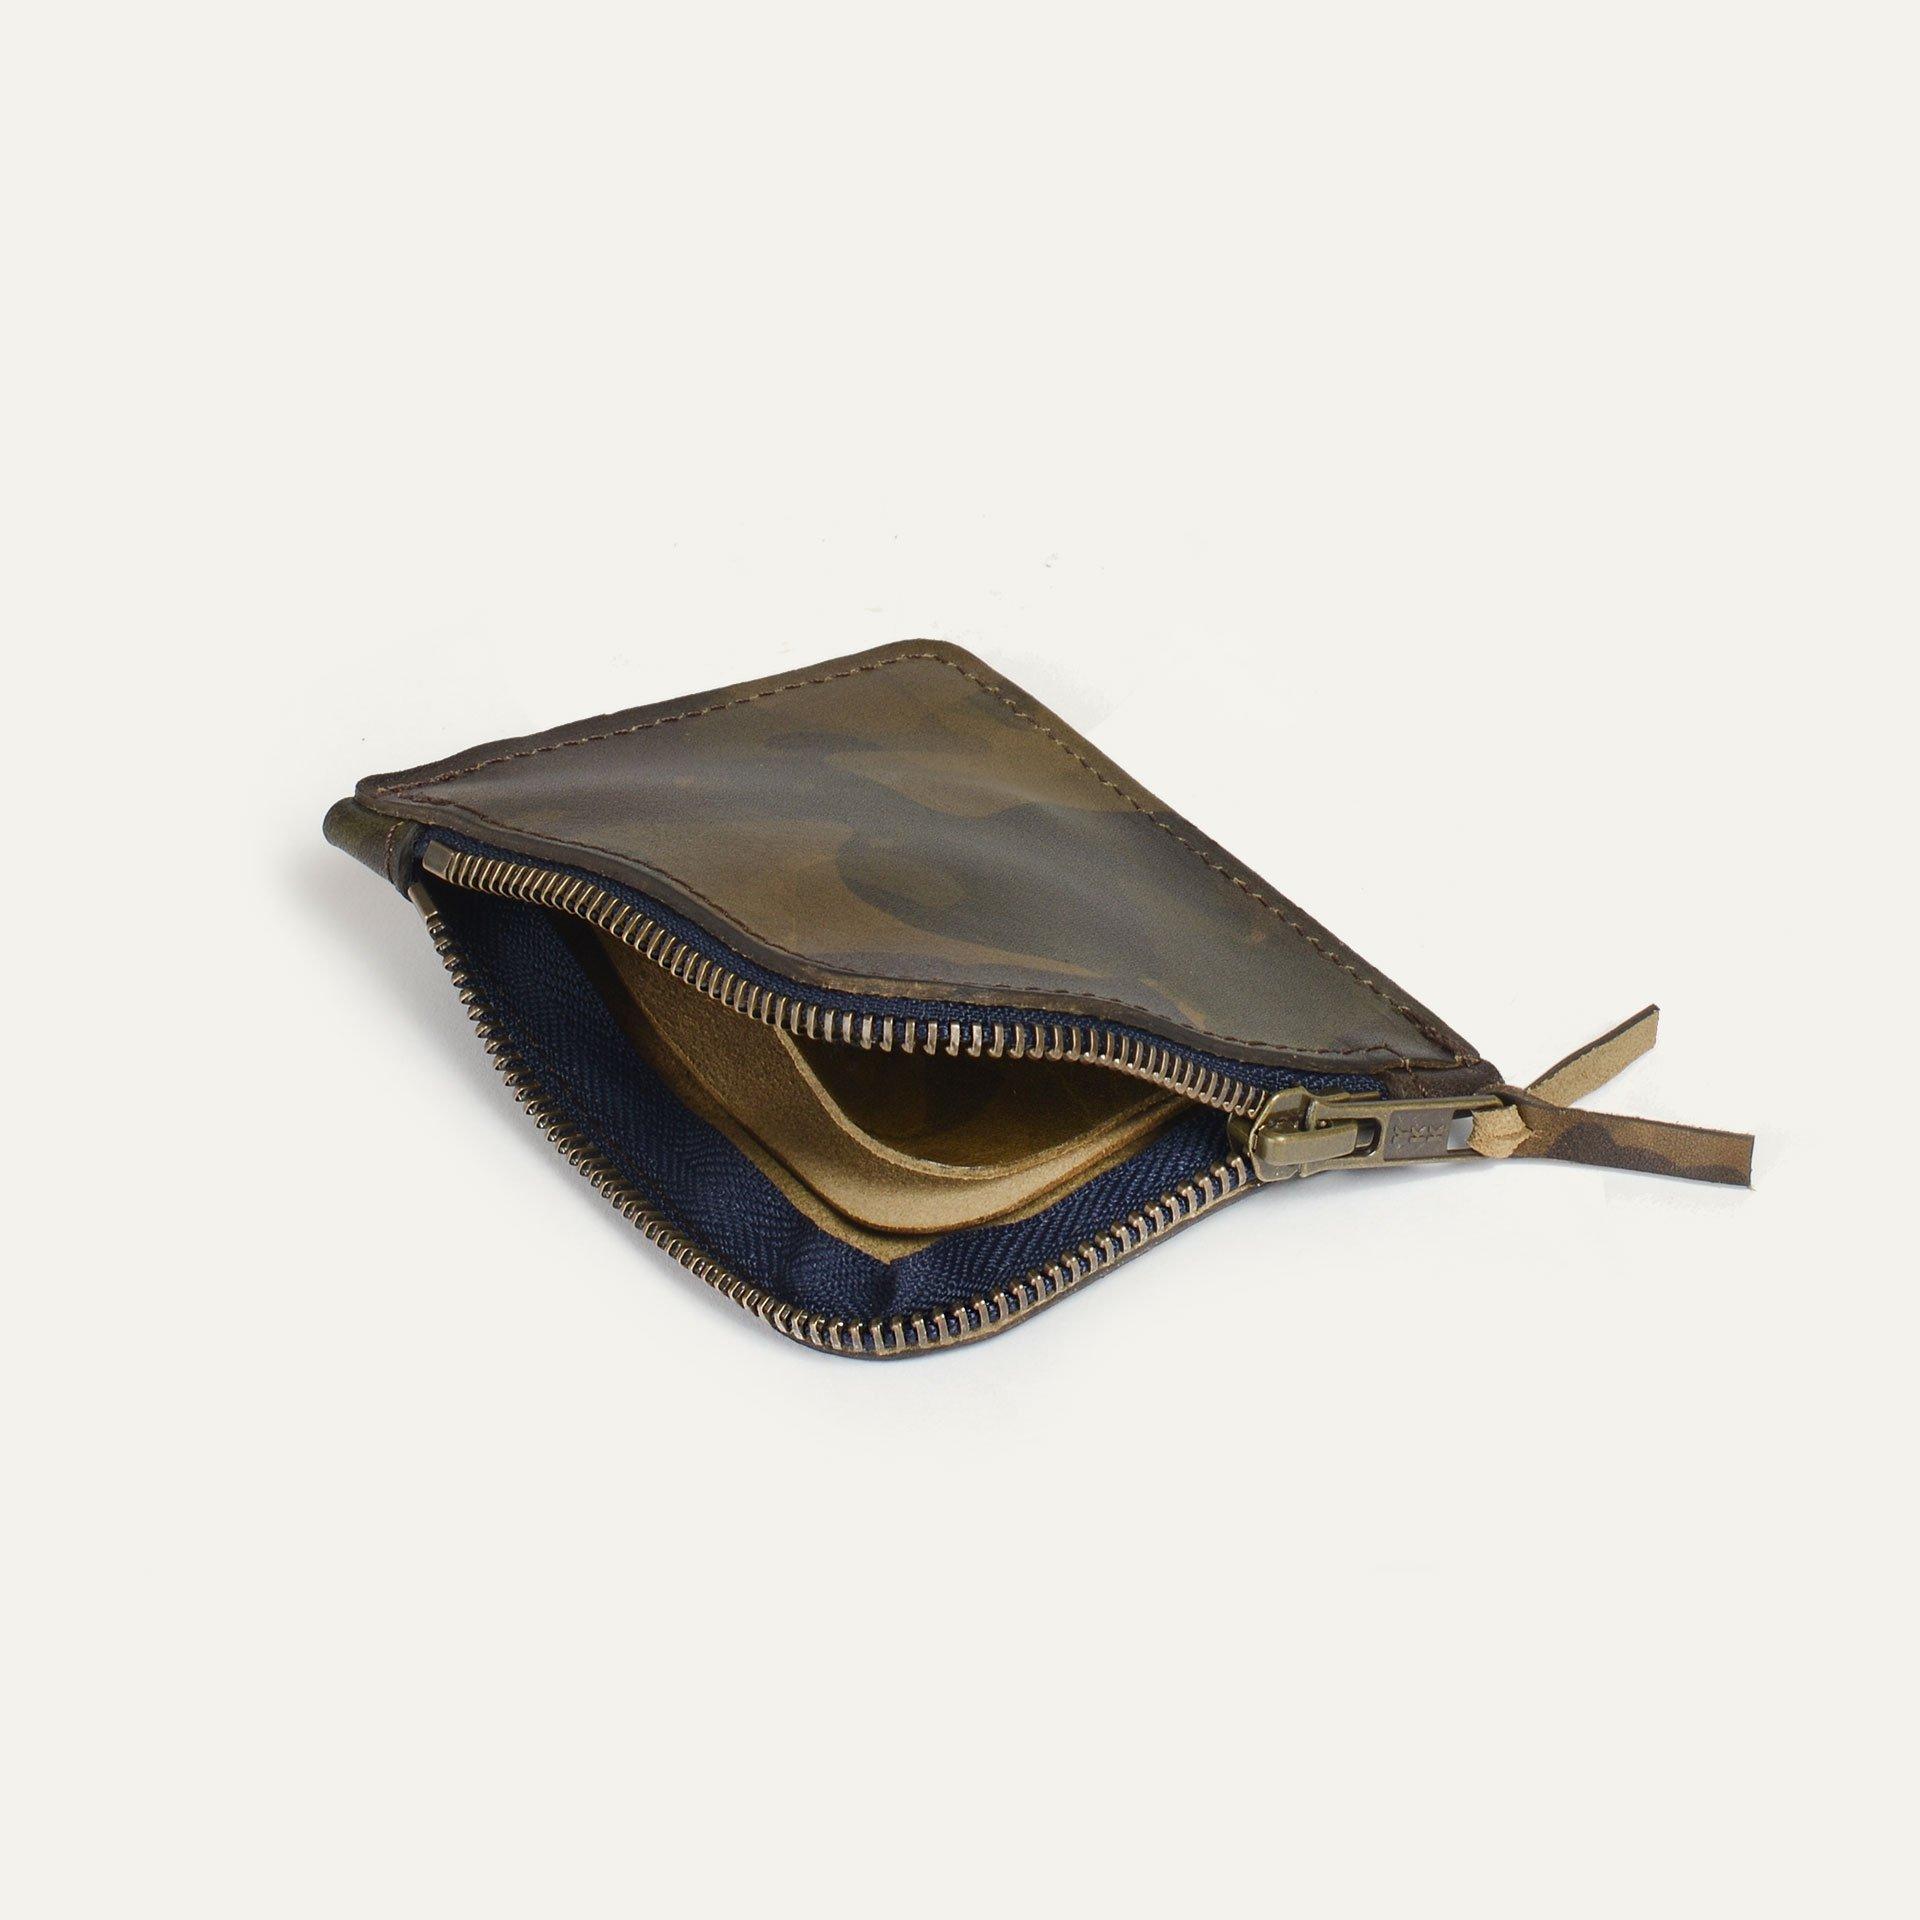 Porte monnaie zippé As / M - Camo (image n°3)